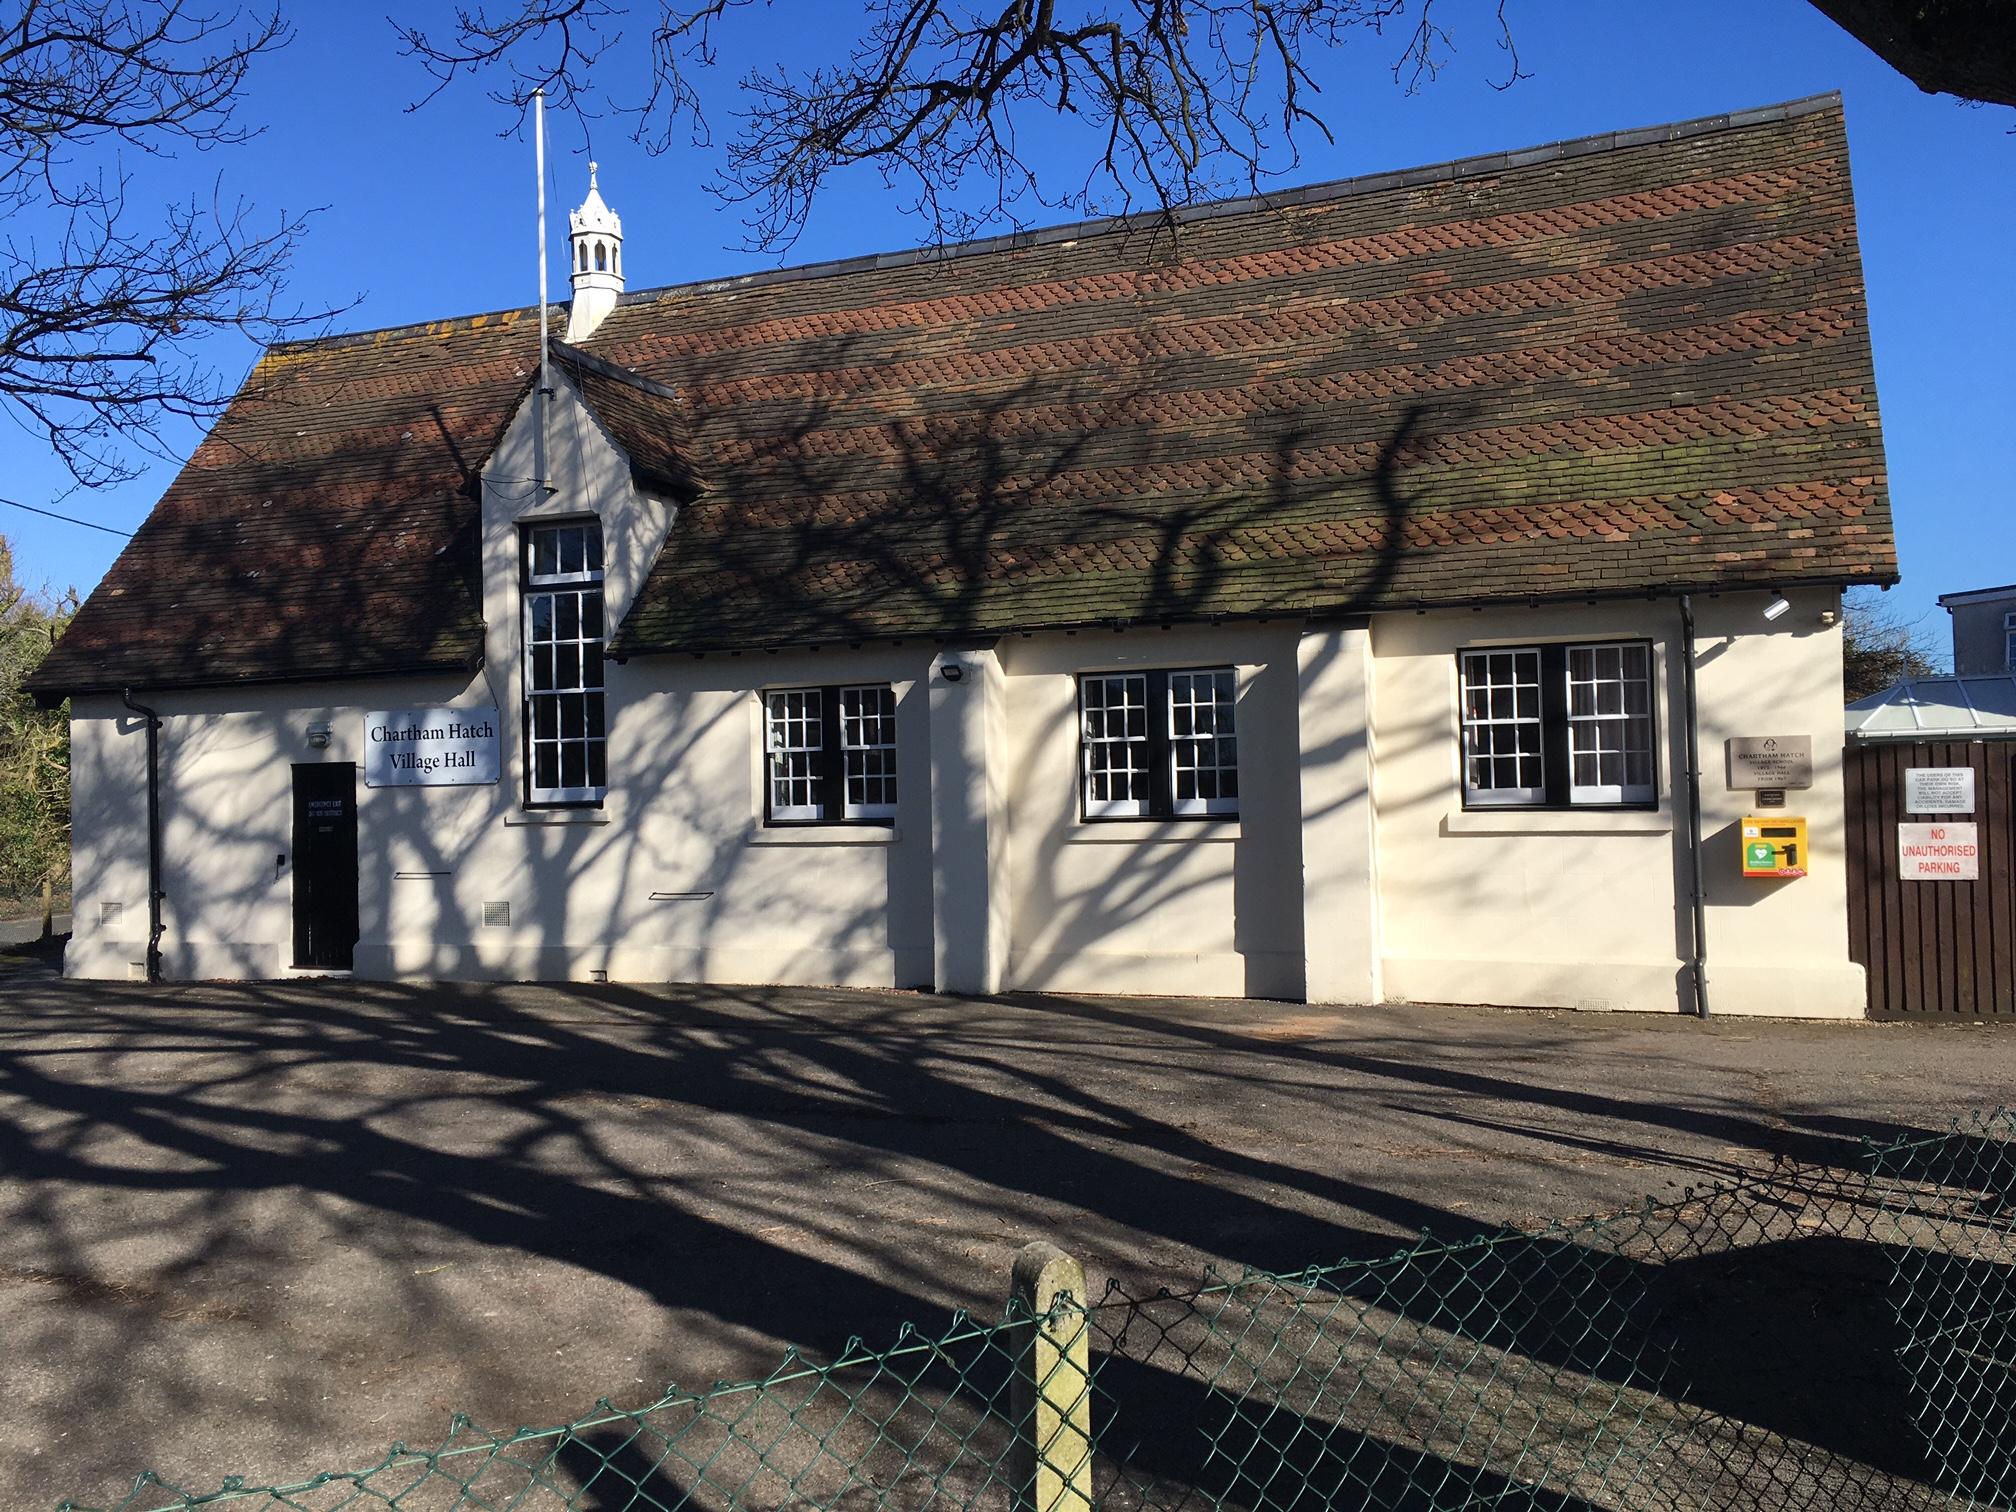 Chartham Hatch Village Hall.JPG